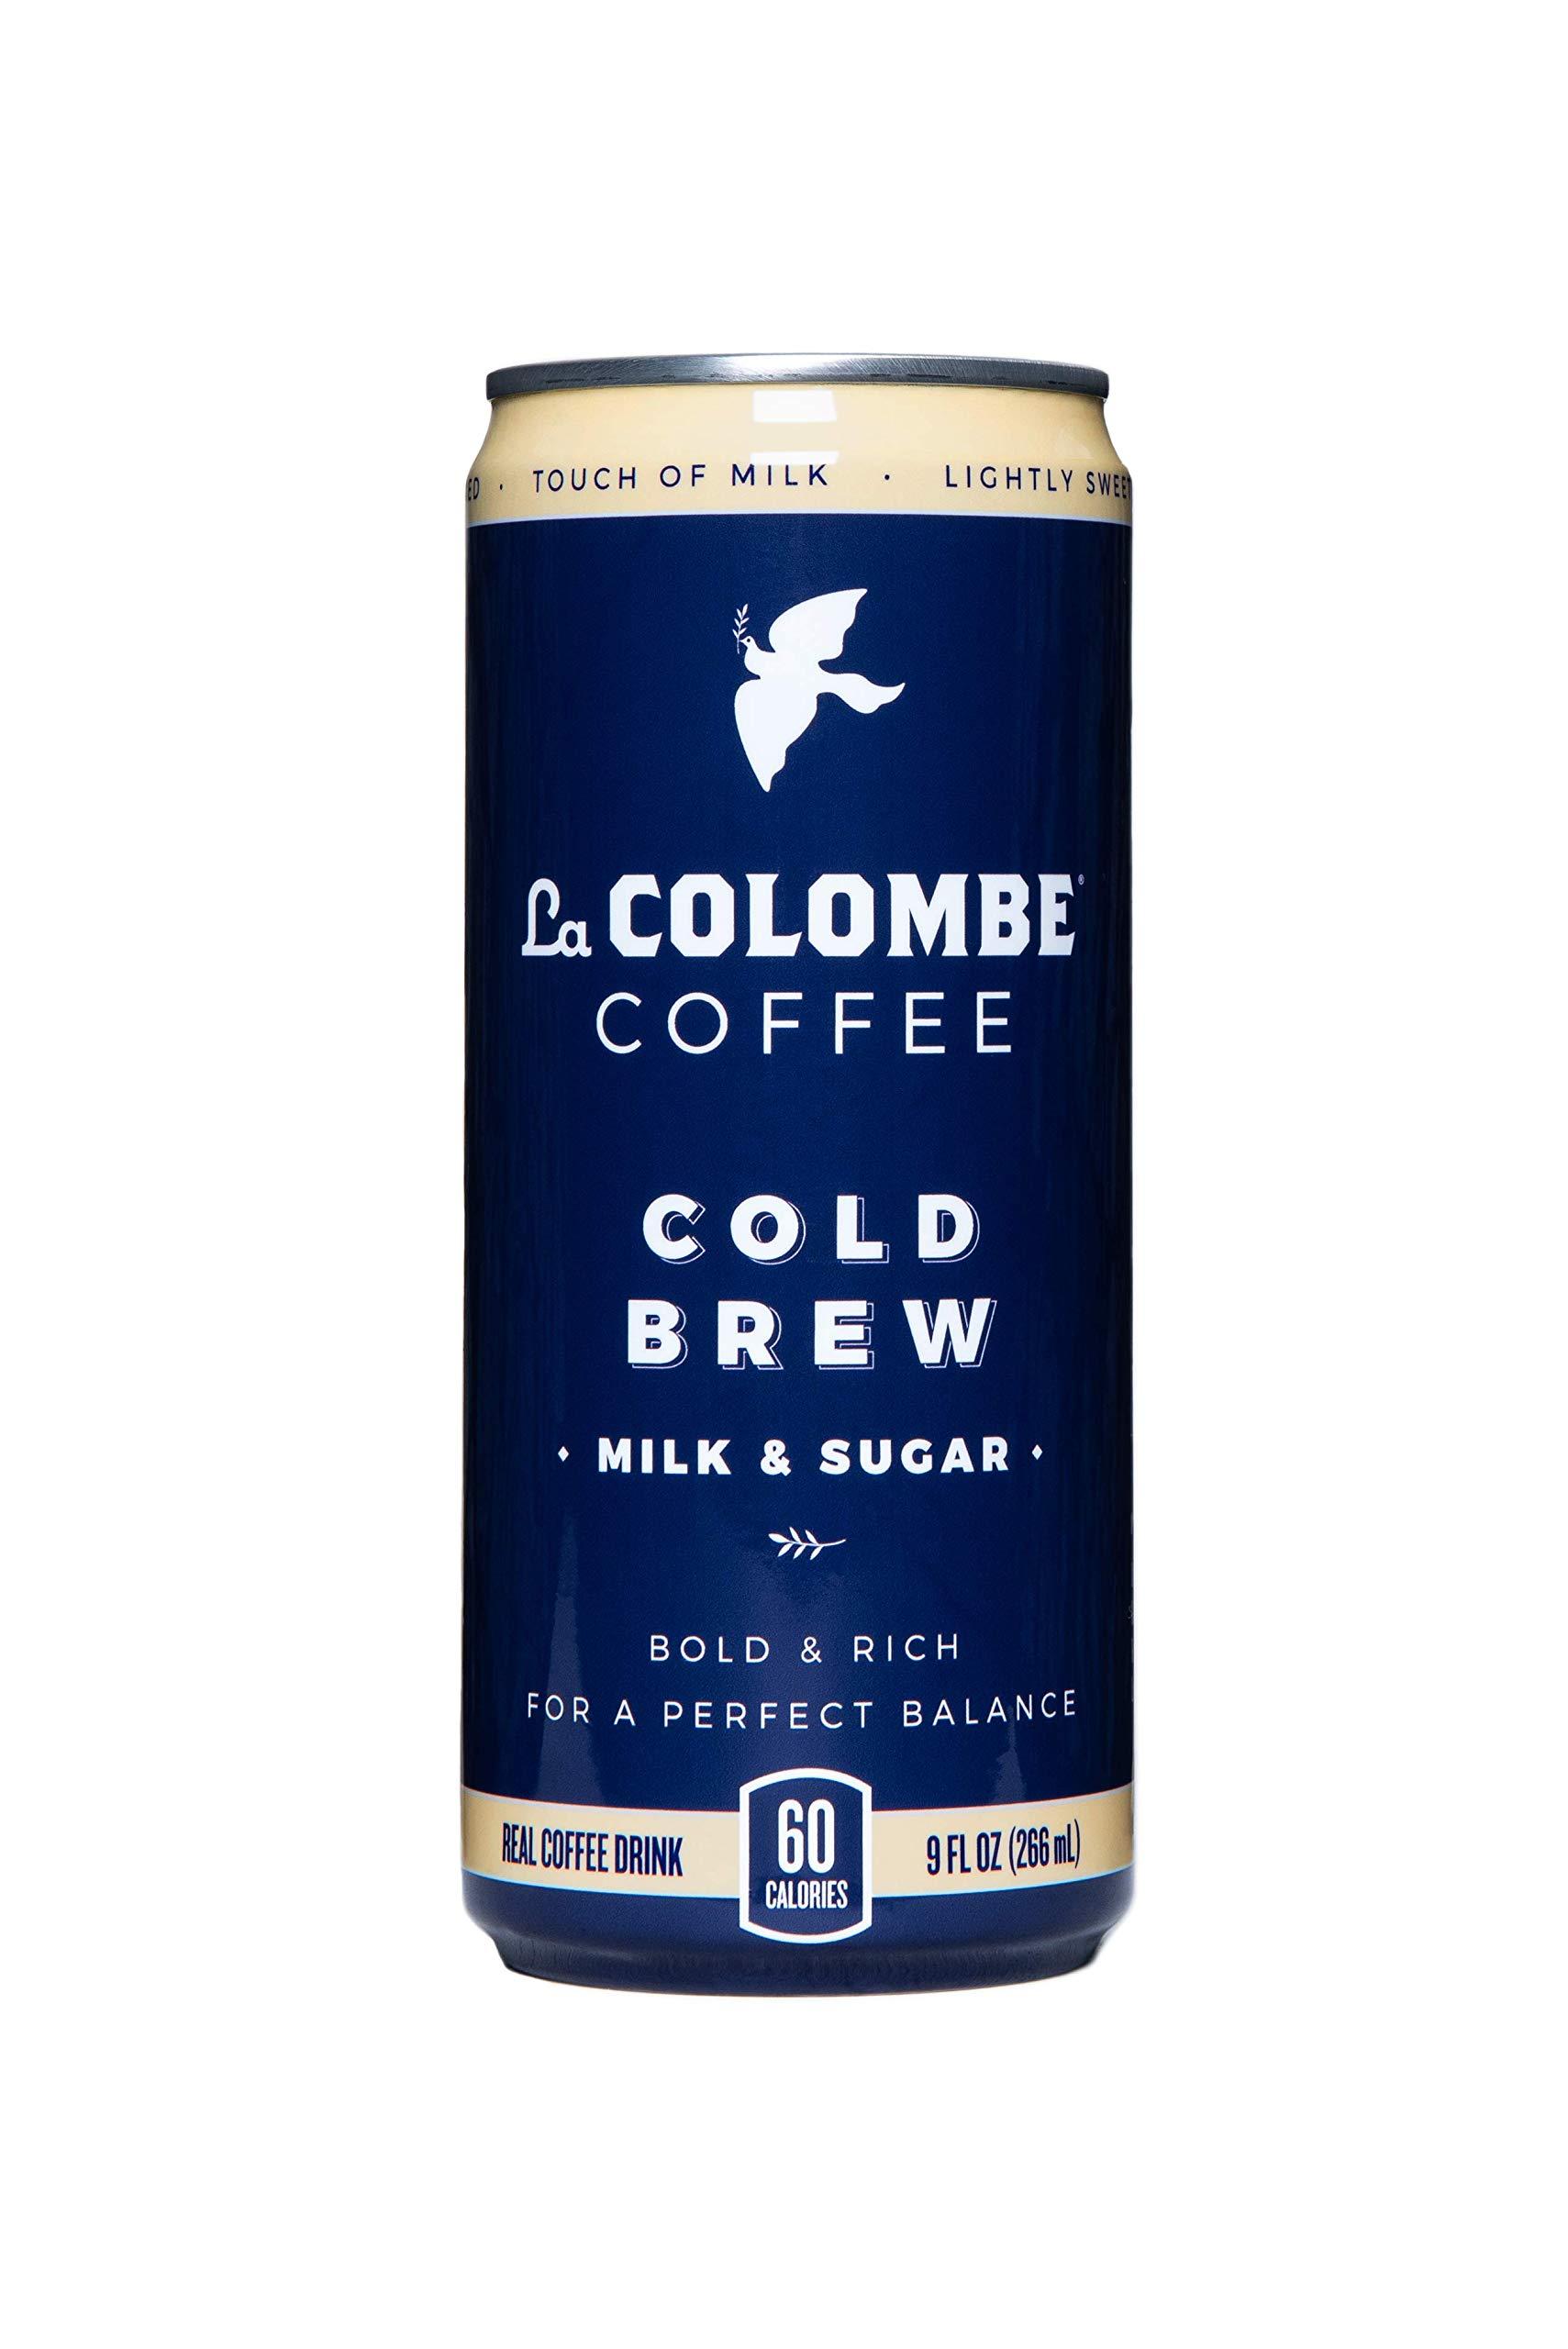 La Colombe Pure Black & White Cold-Pressed Coffee - 9 Fluid Ounce, 16 Count - Touch of Cream and Sugar - Medium Roast, Single-Origin Cold Brew - Grab And Go Coffee